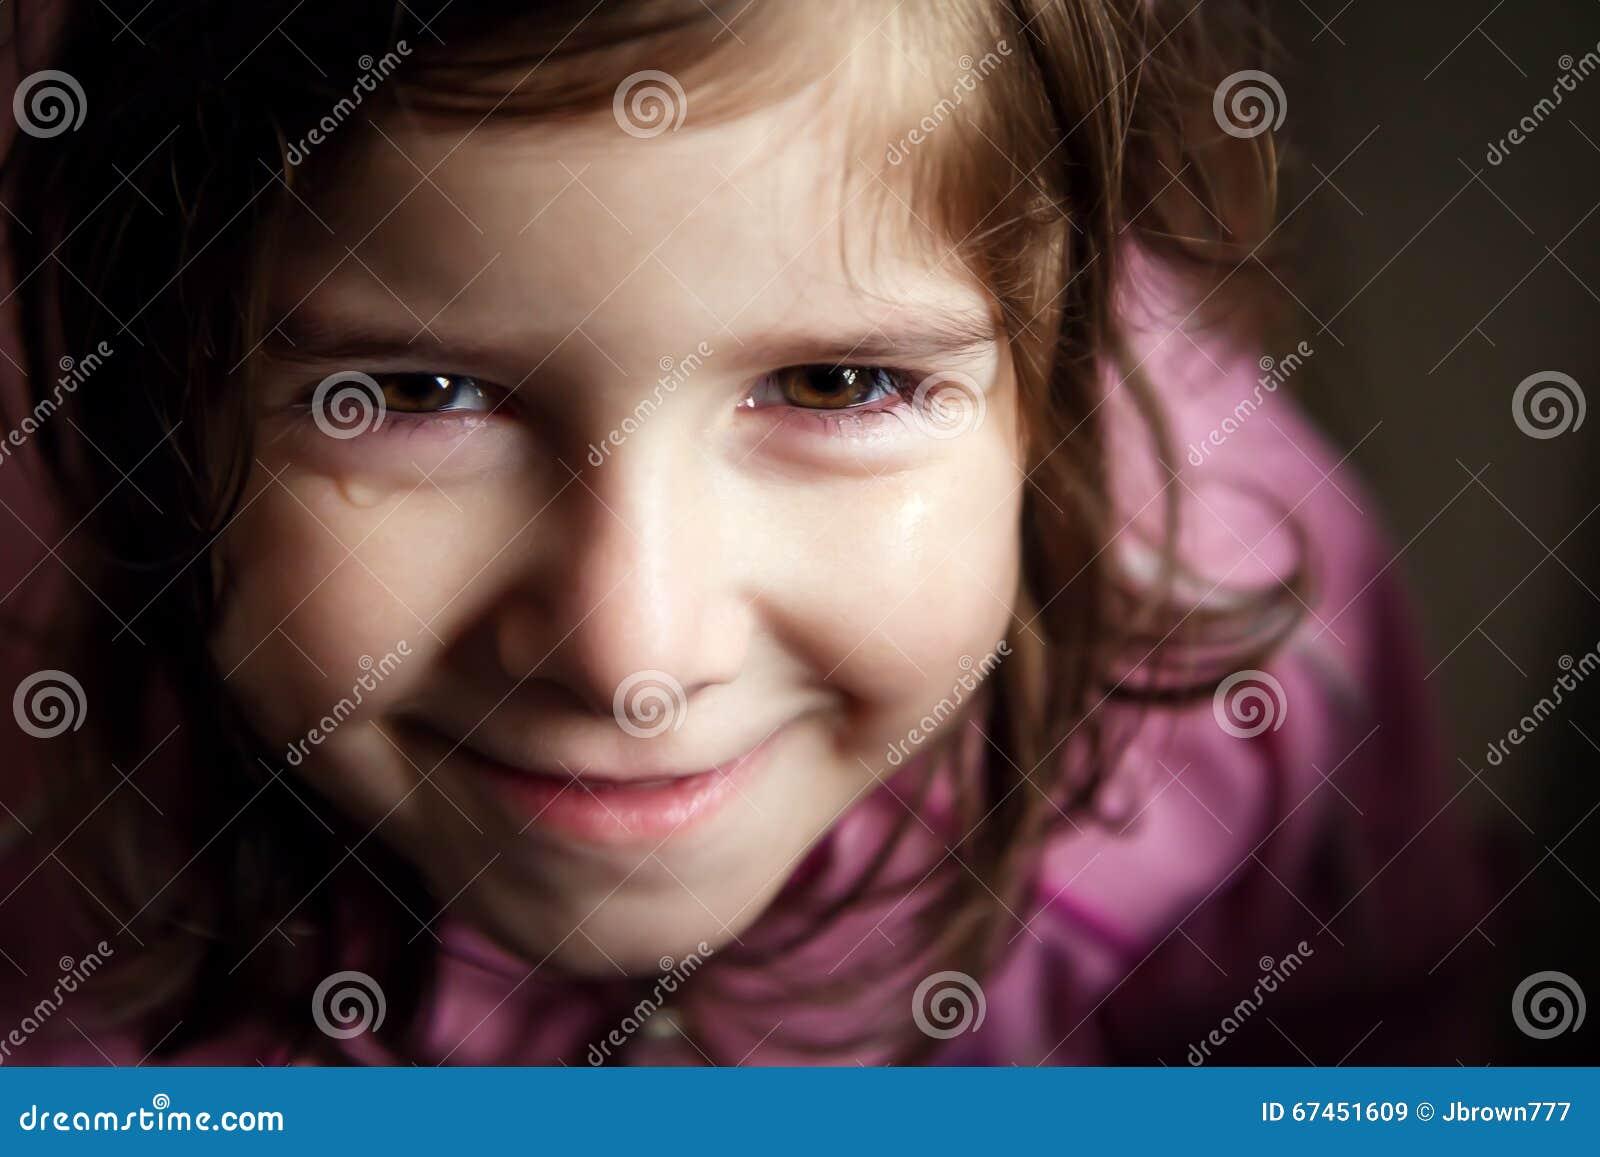 smile with tears U-ka saegusa in db - smile & tears (tradução) (letra e música para ouvir) - shagamikonda nobori zaka no tochuu / asedaku demo mukuwarenai koto ga oo.